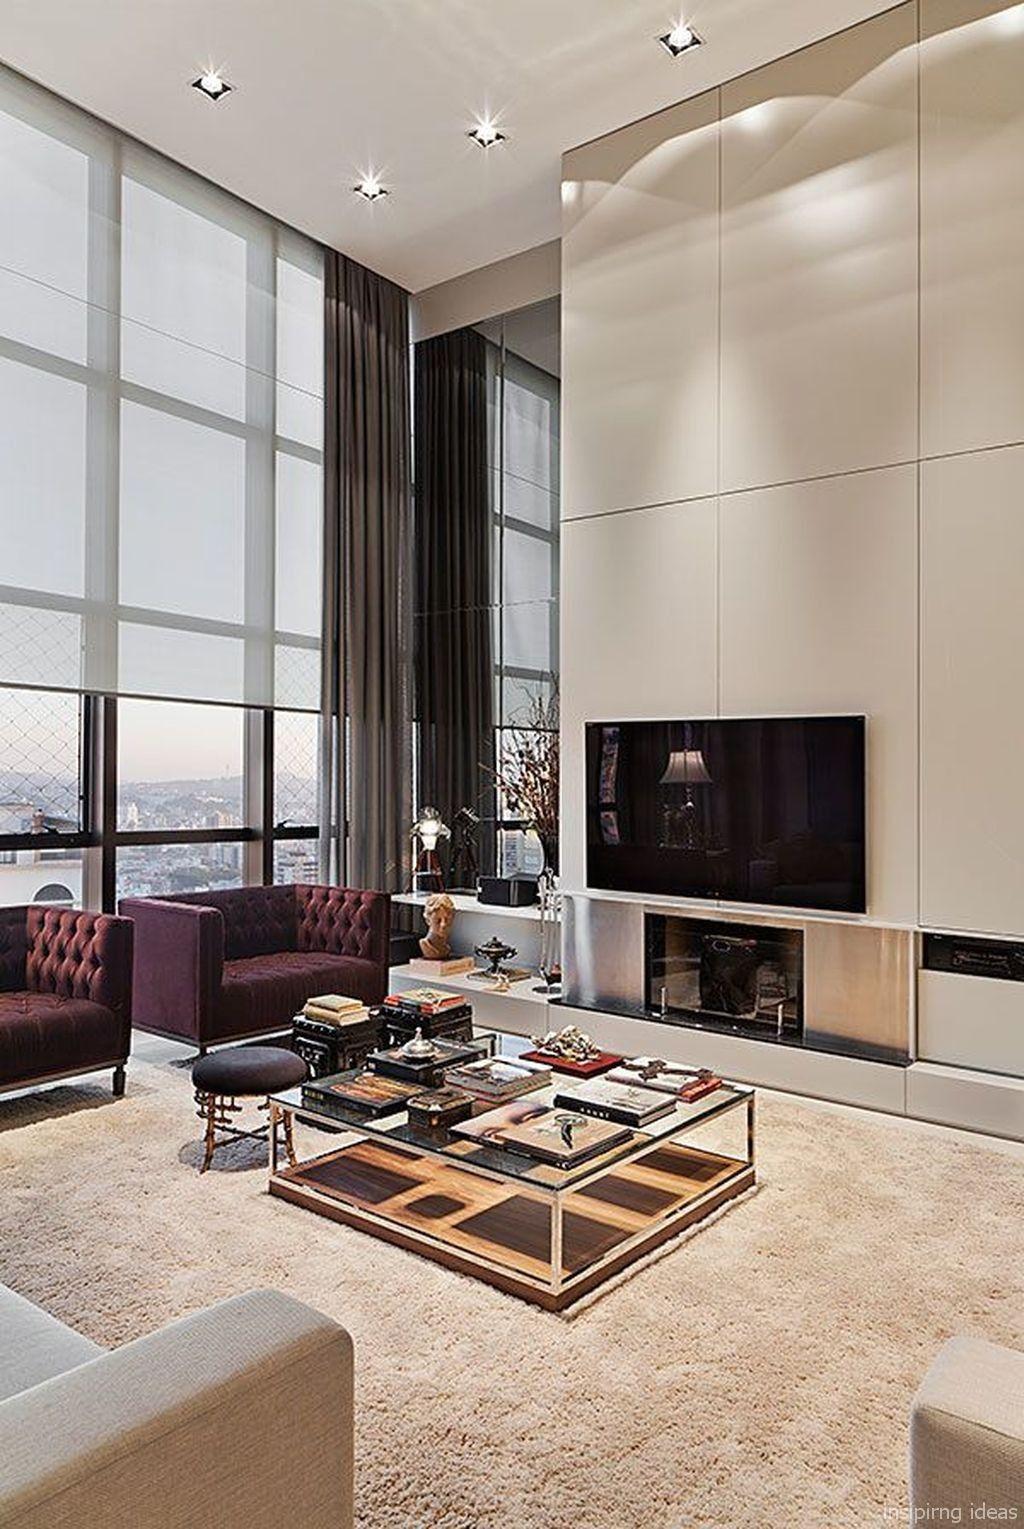 Luxury Modern Apartment Living Room Decorating Ideas On A Budget Living Room Decor Modern Living Room Modern Living Room Decor Apartment